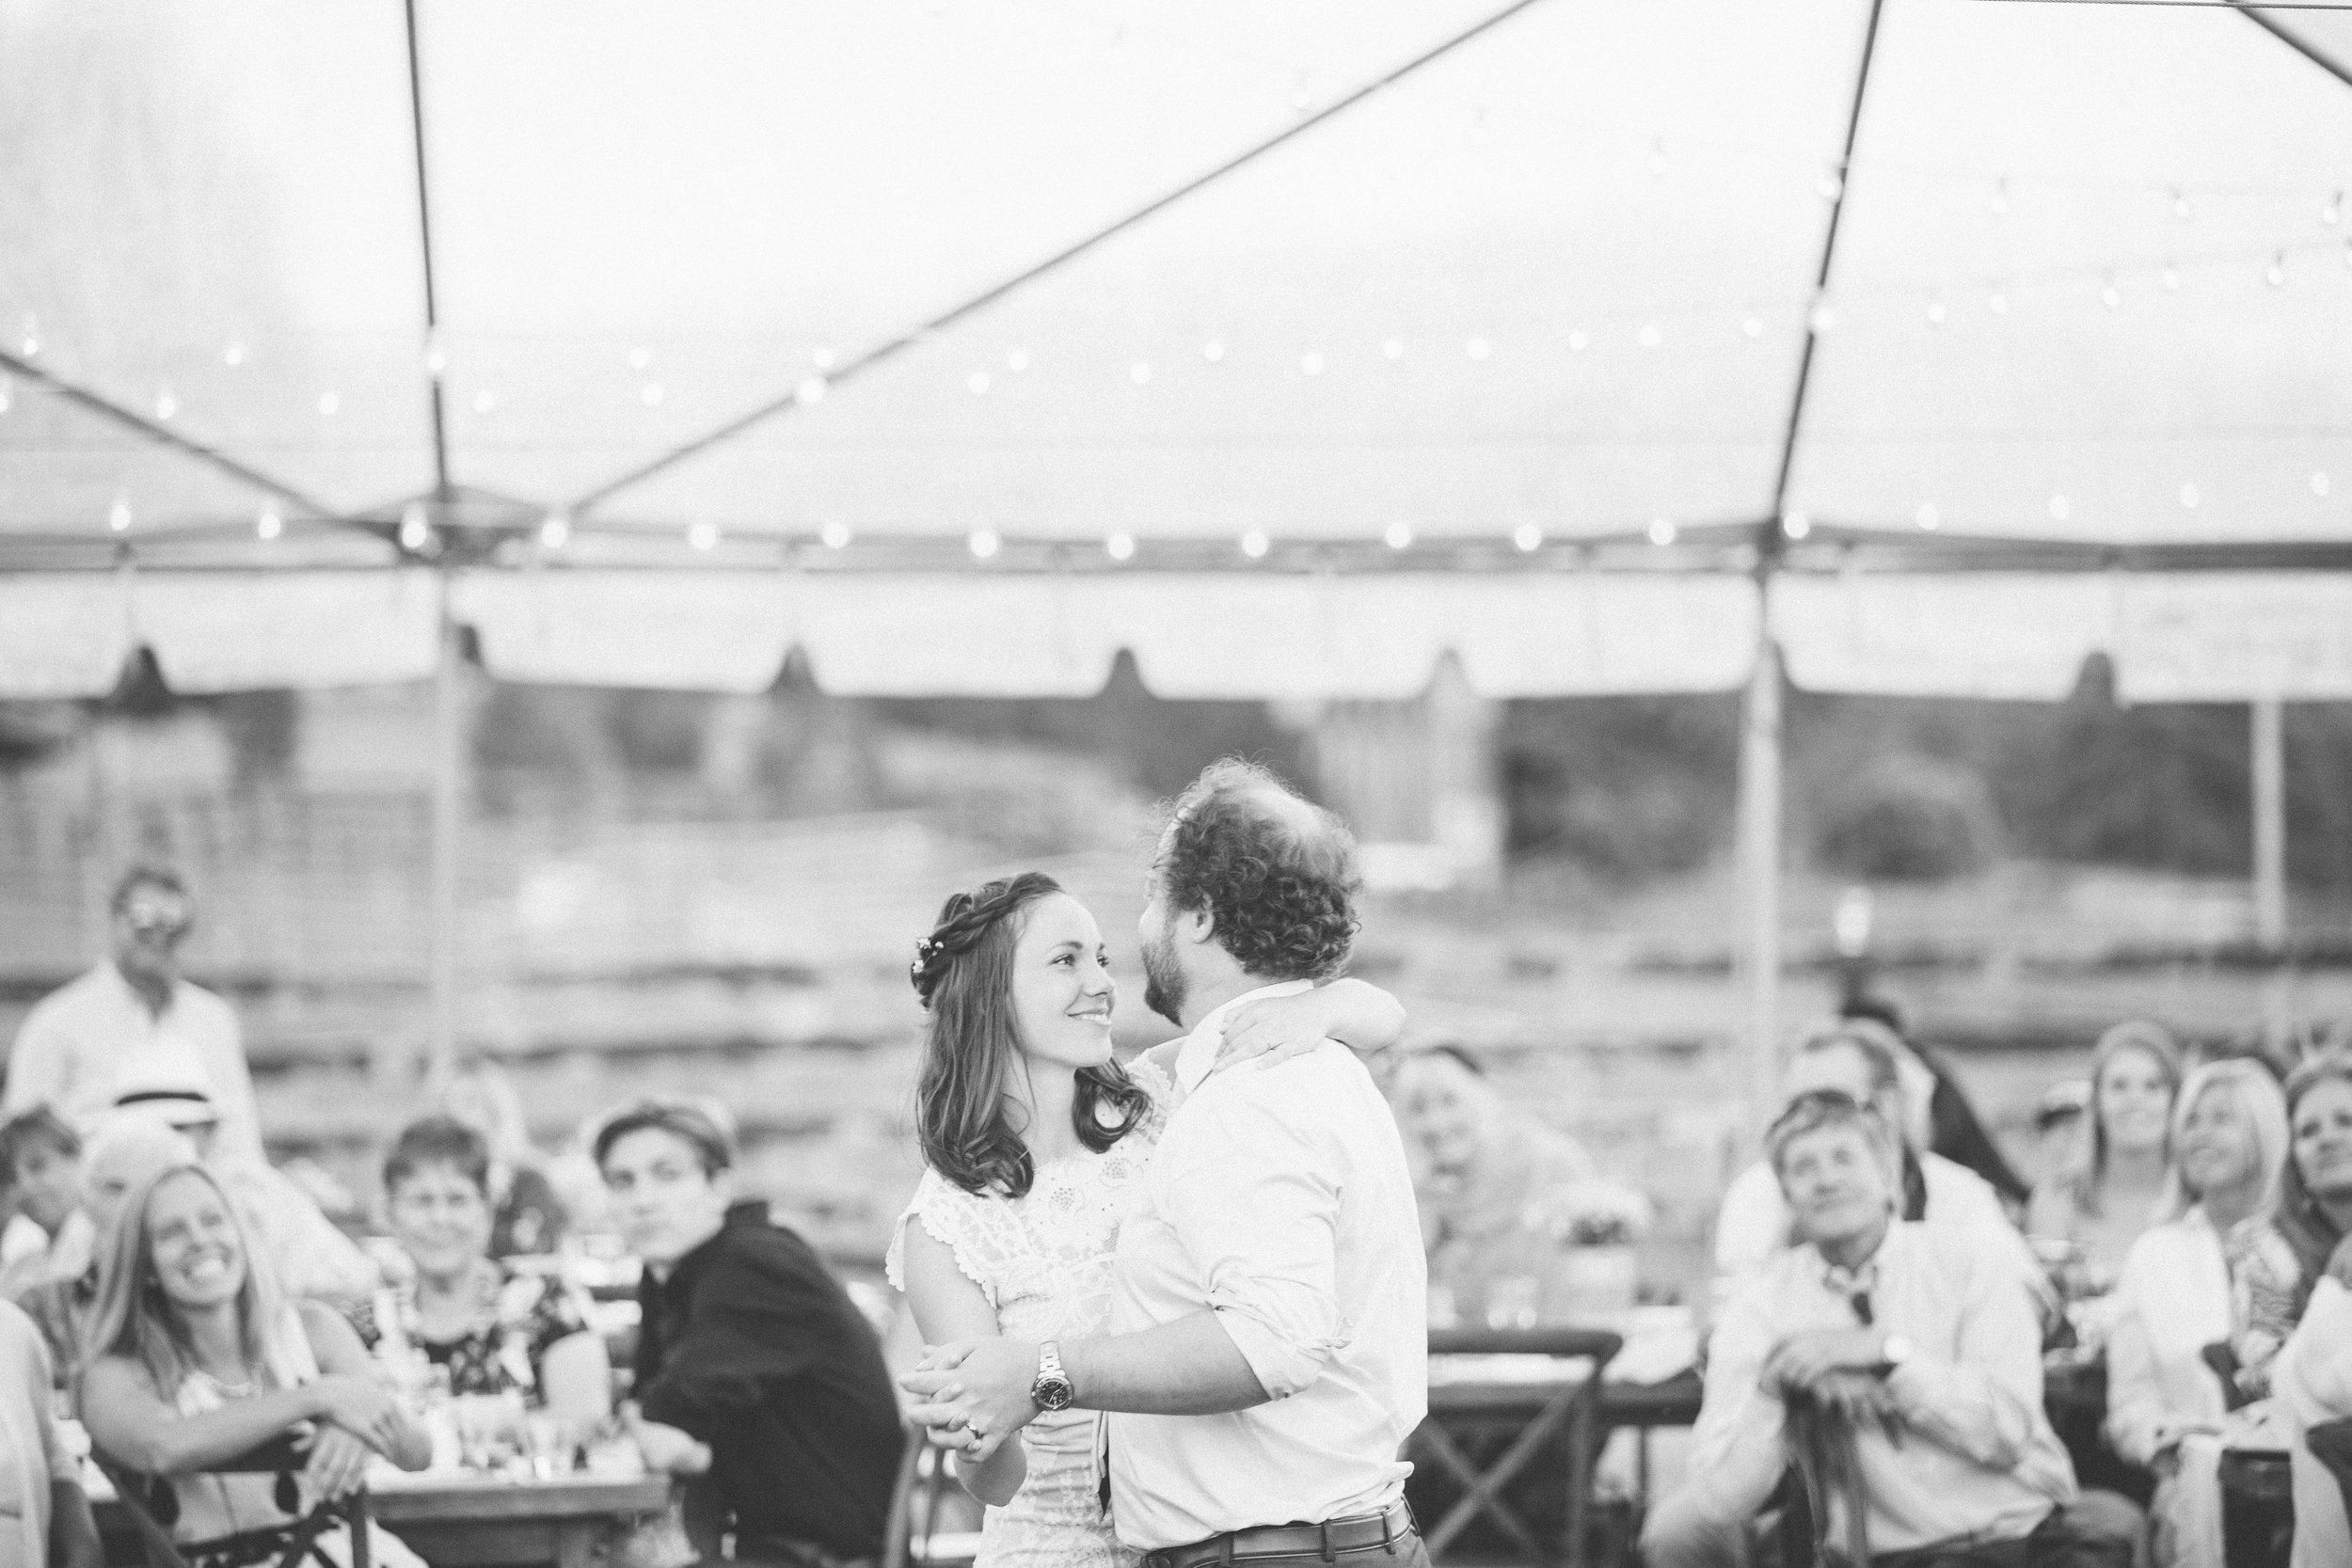 MP_16.07.09_Drew-&-Erin-Wedding-Evergreen-9236.jpg